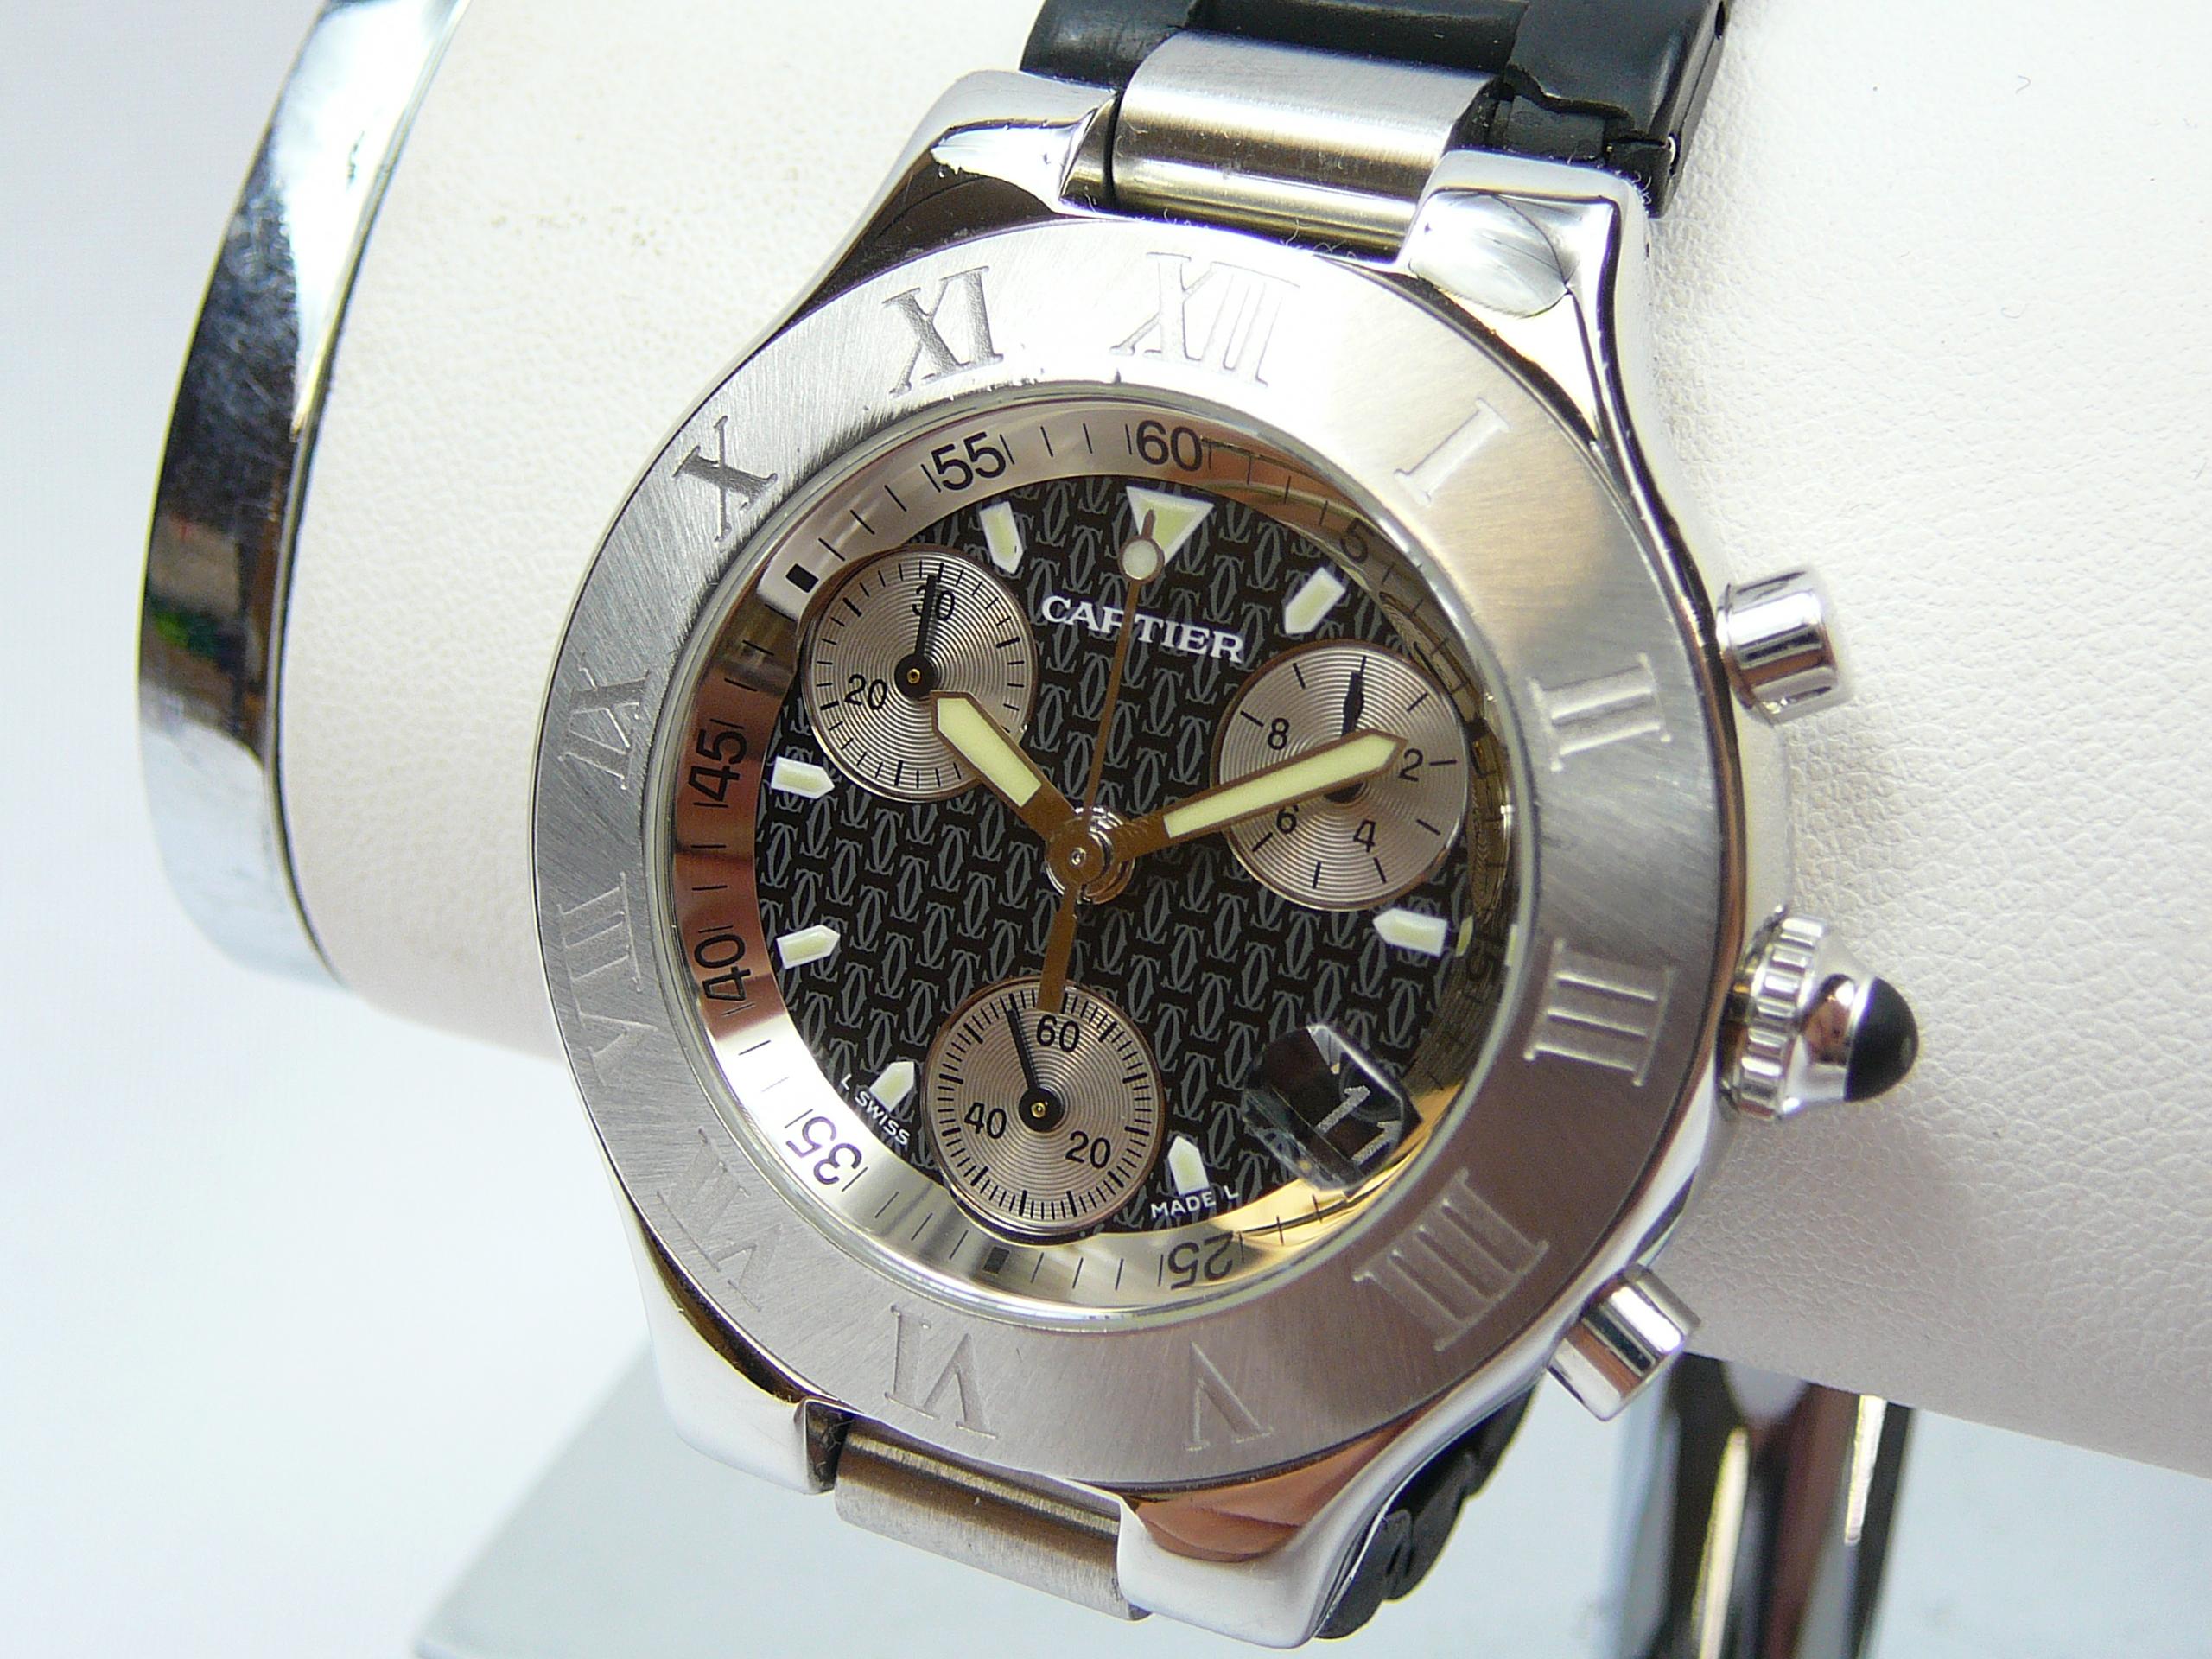 Gents Cartier Wrist Watch - Image 2 of 3